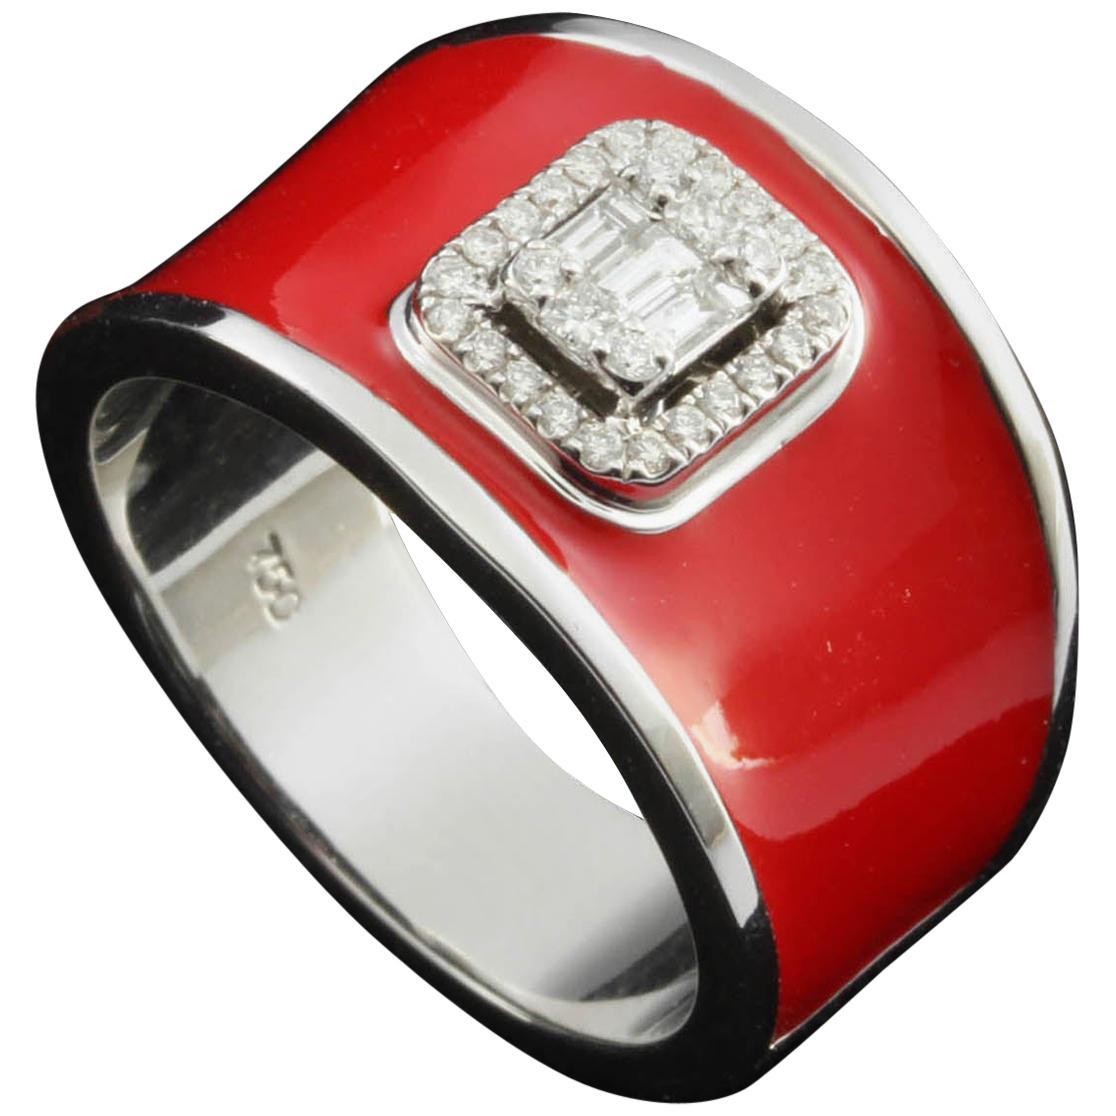 Diamond Emerald Illusion Fashion Ring with Red Enamel in 18 Karat Gold